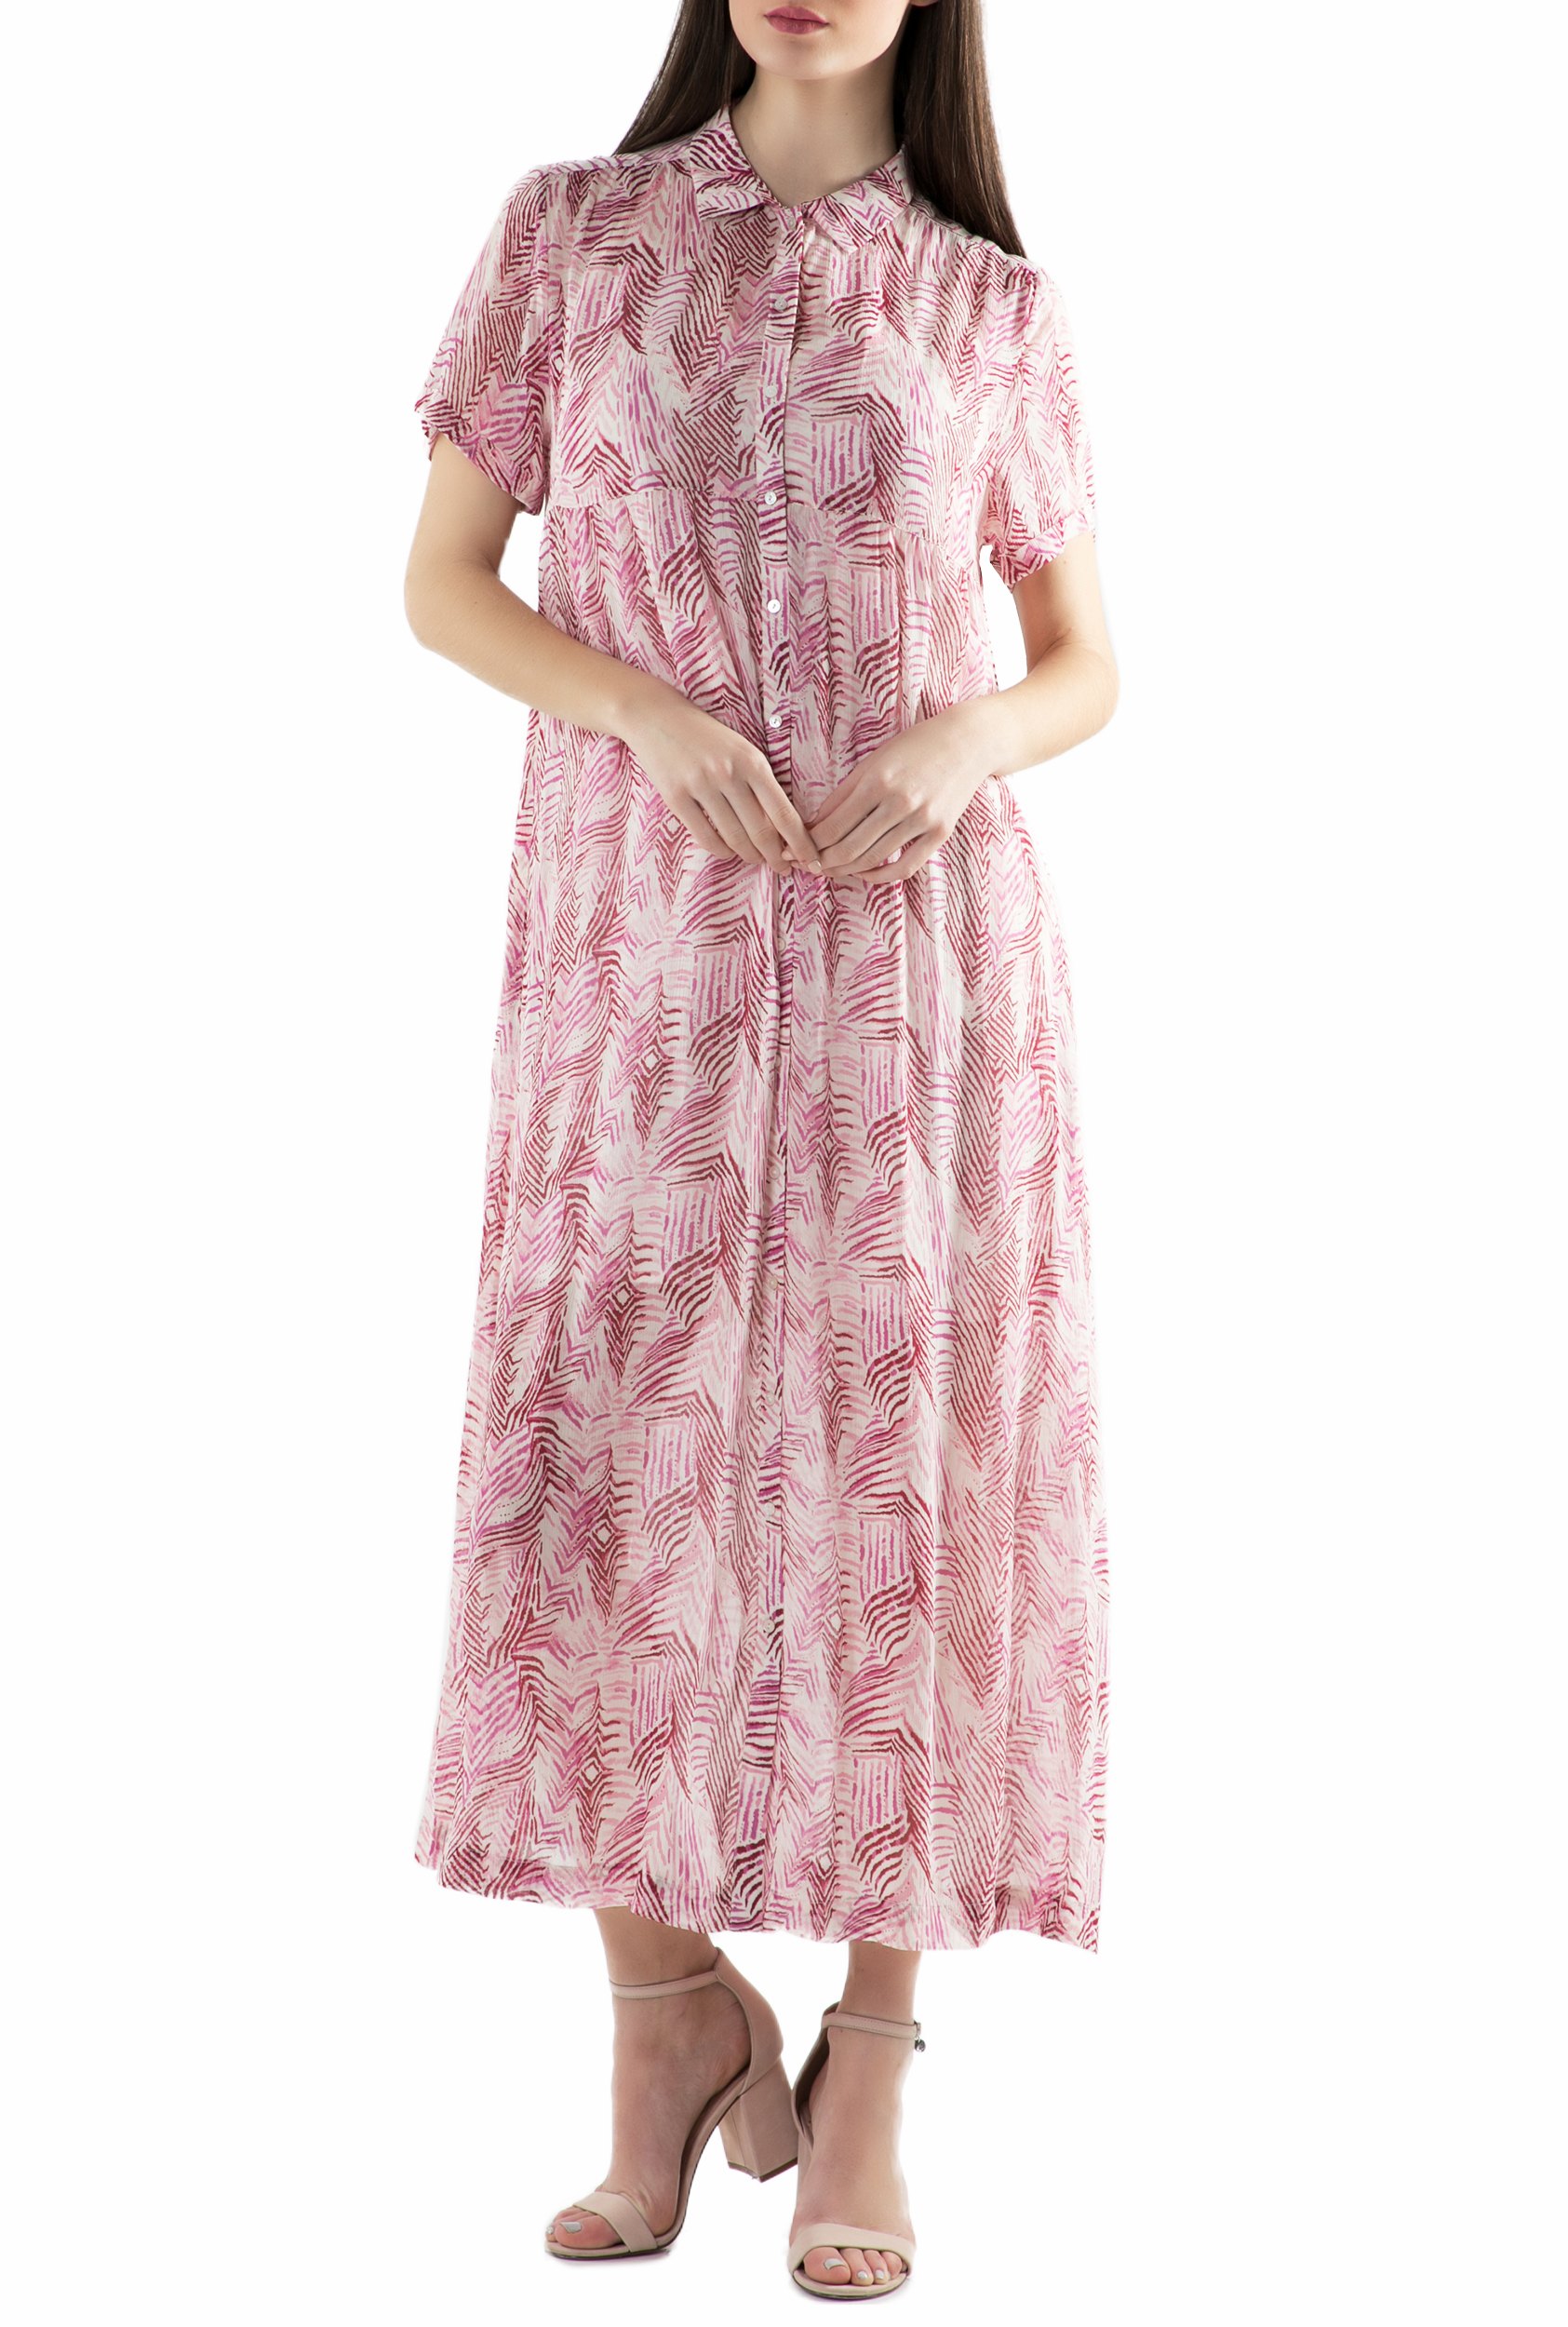 SCOTCH & SODA - Φόρεμα SCOTCH & SODA ροζ με μοτίβο γυναικεία ρούχα φορέματα μάξι